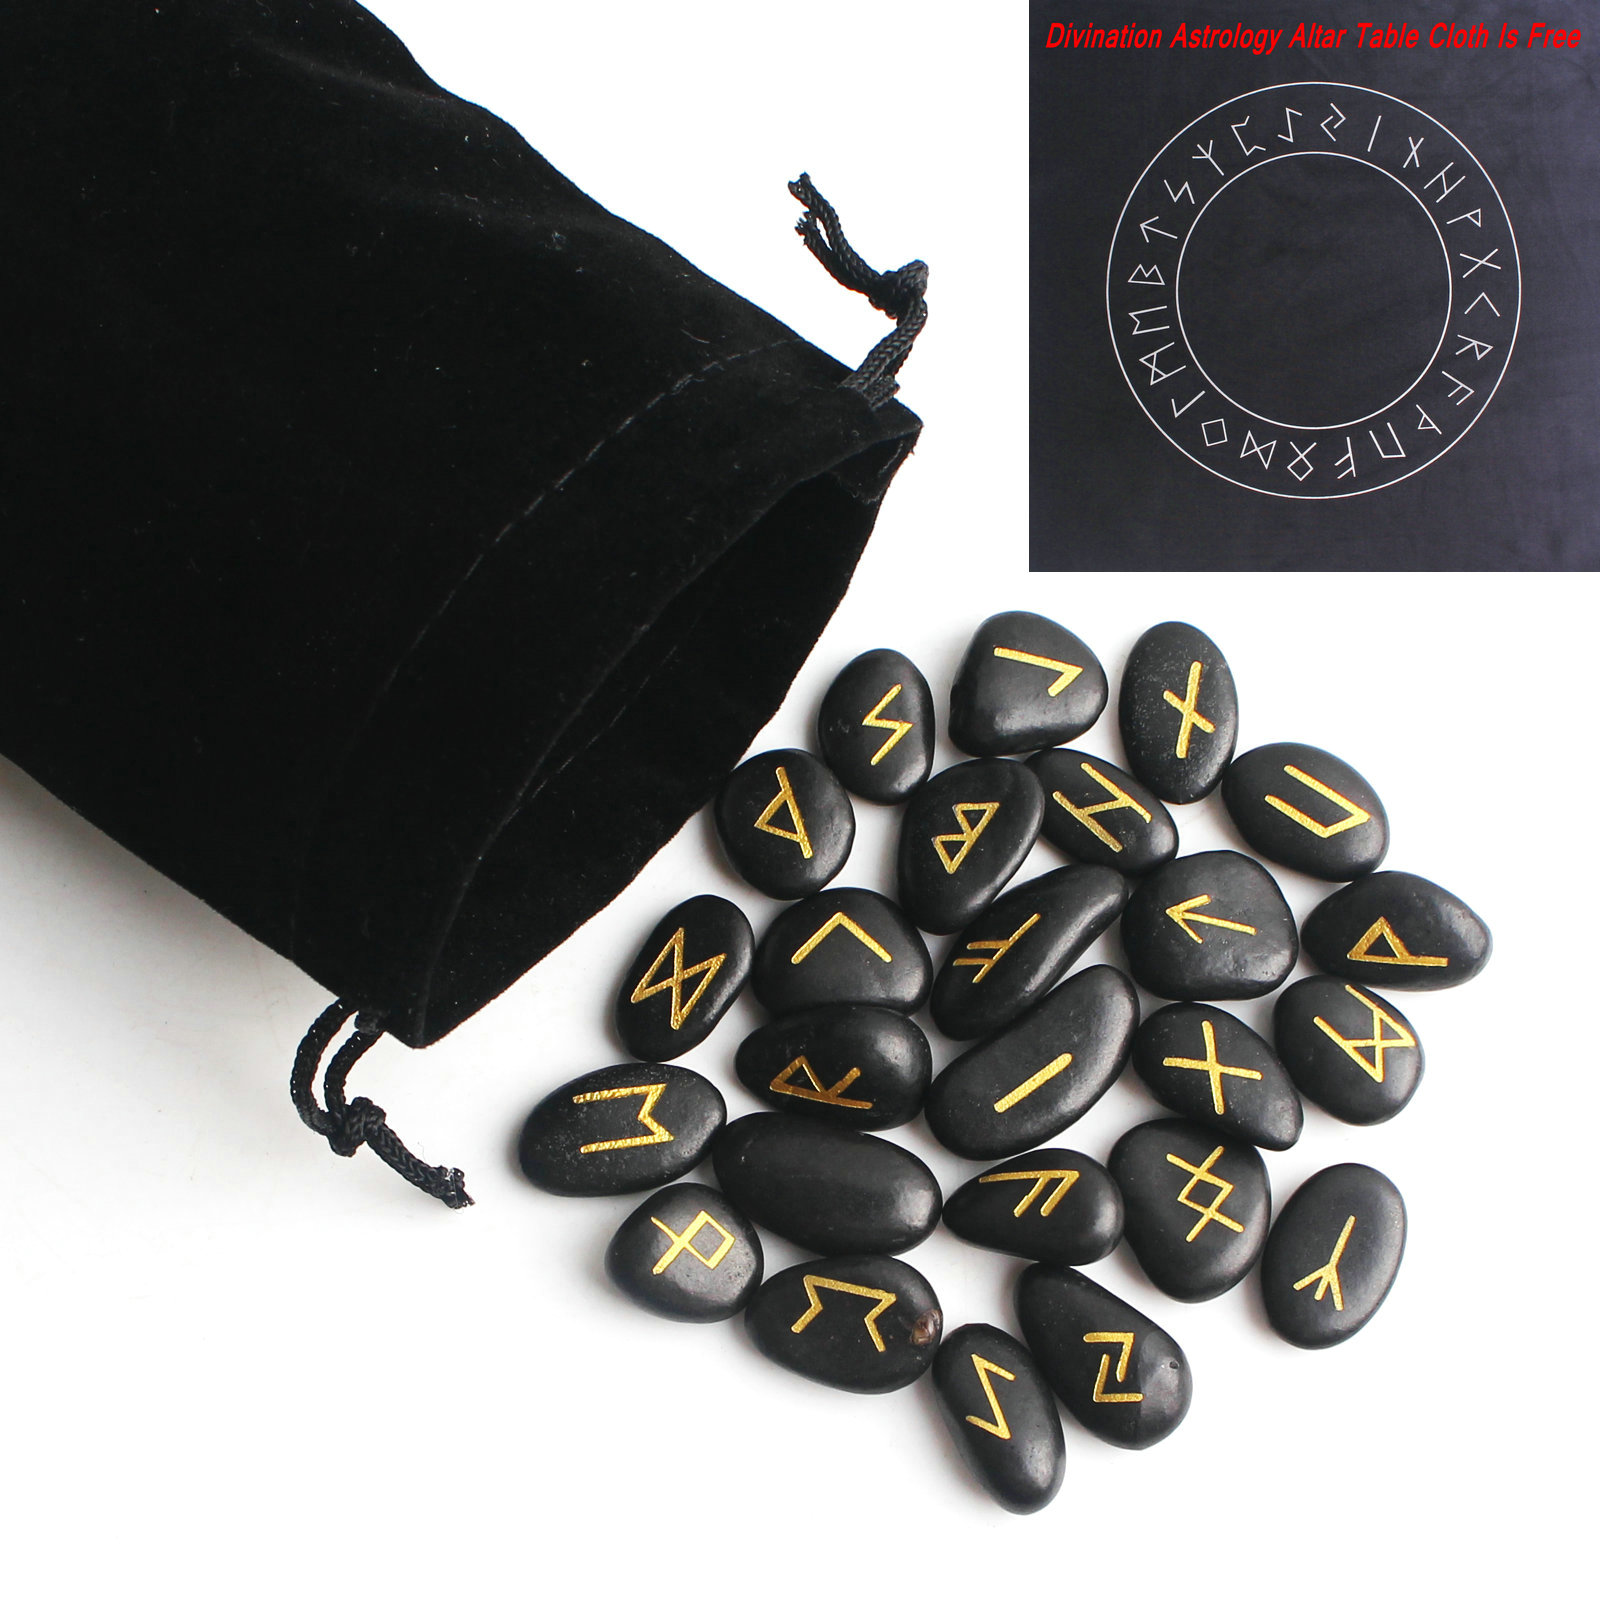 25Pcs Natural Black Riverstones Chakra Divination Rune Crystal Freedom Shaped Pendant Stone Gemstone Healing Stone Decor